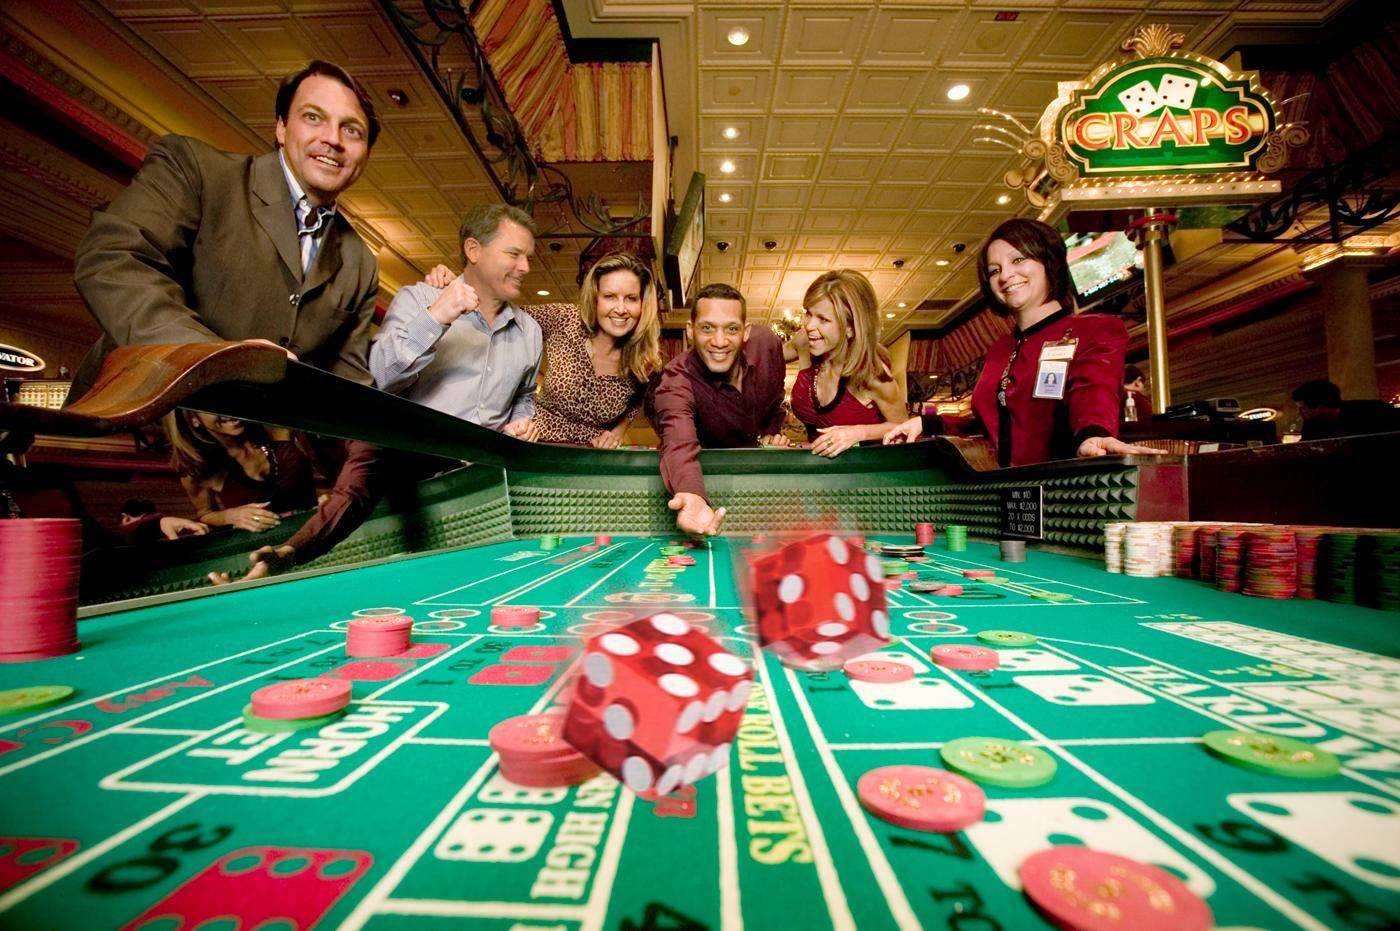 Starlive casino poker port casino poker android